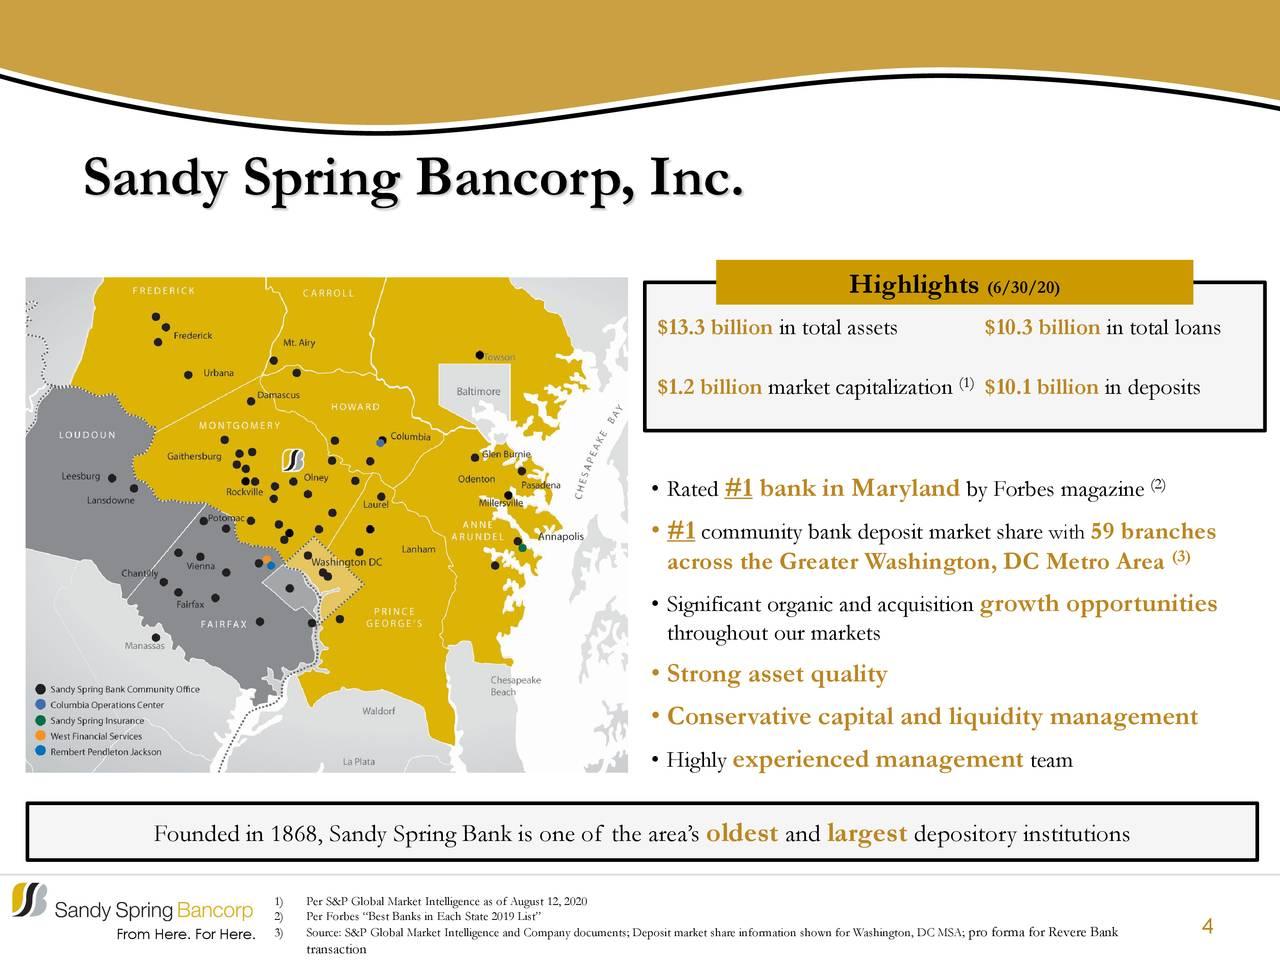 Sandy Spring Bancorp, Inc.